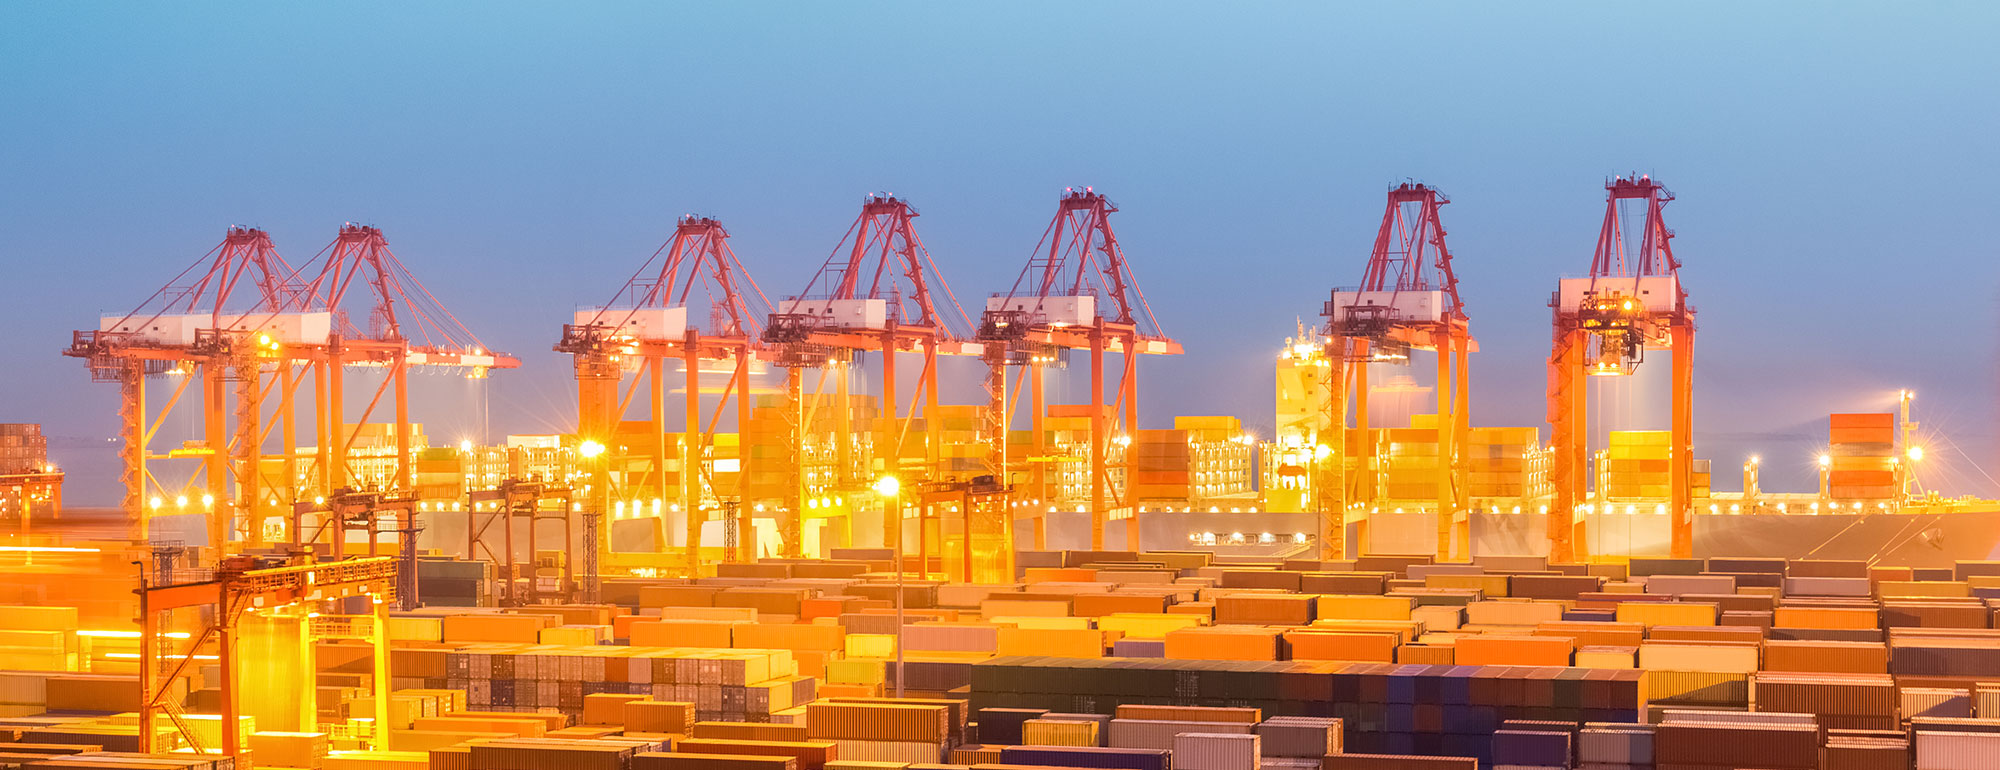 Customs tariffs updated 2020 December